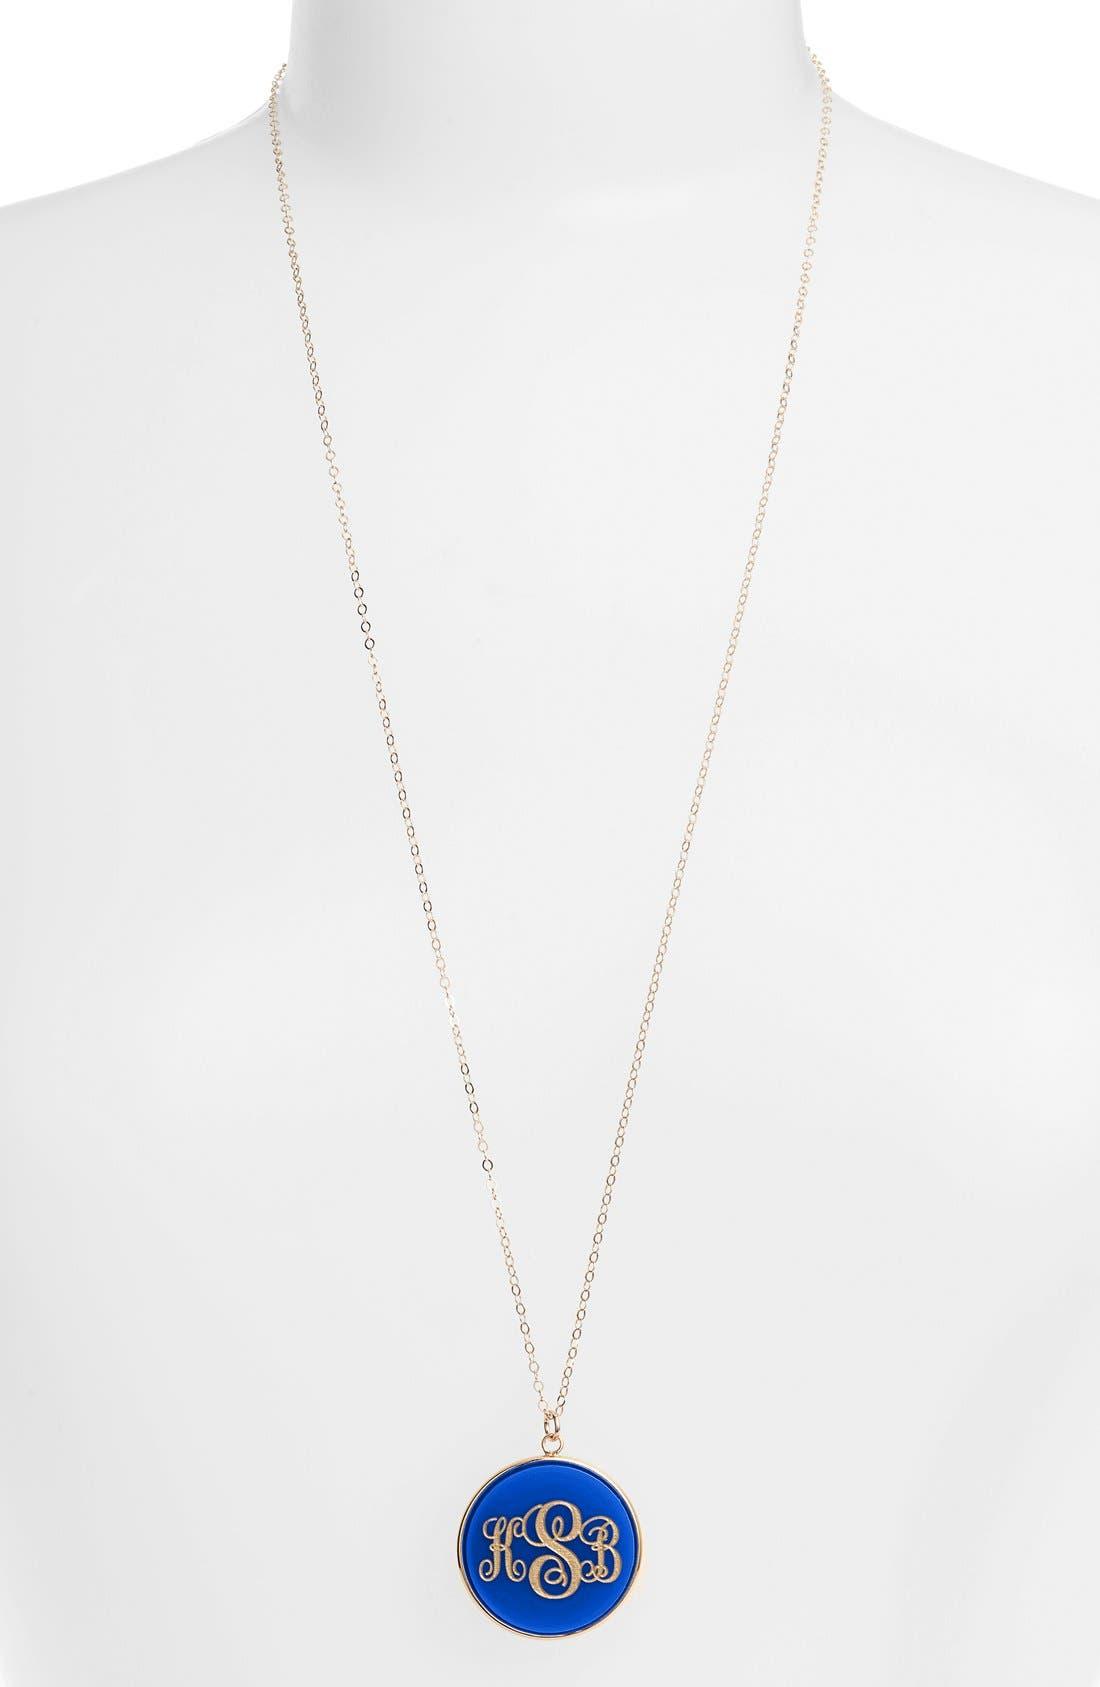 Moon and Lola 'Vineyard' Personalized Monogram Pendant Necklace